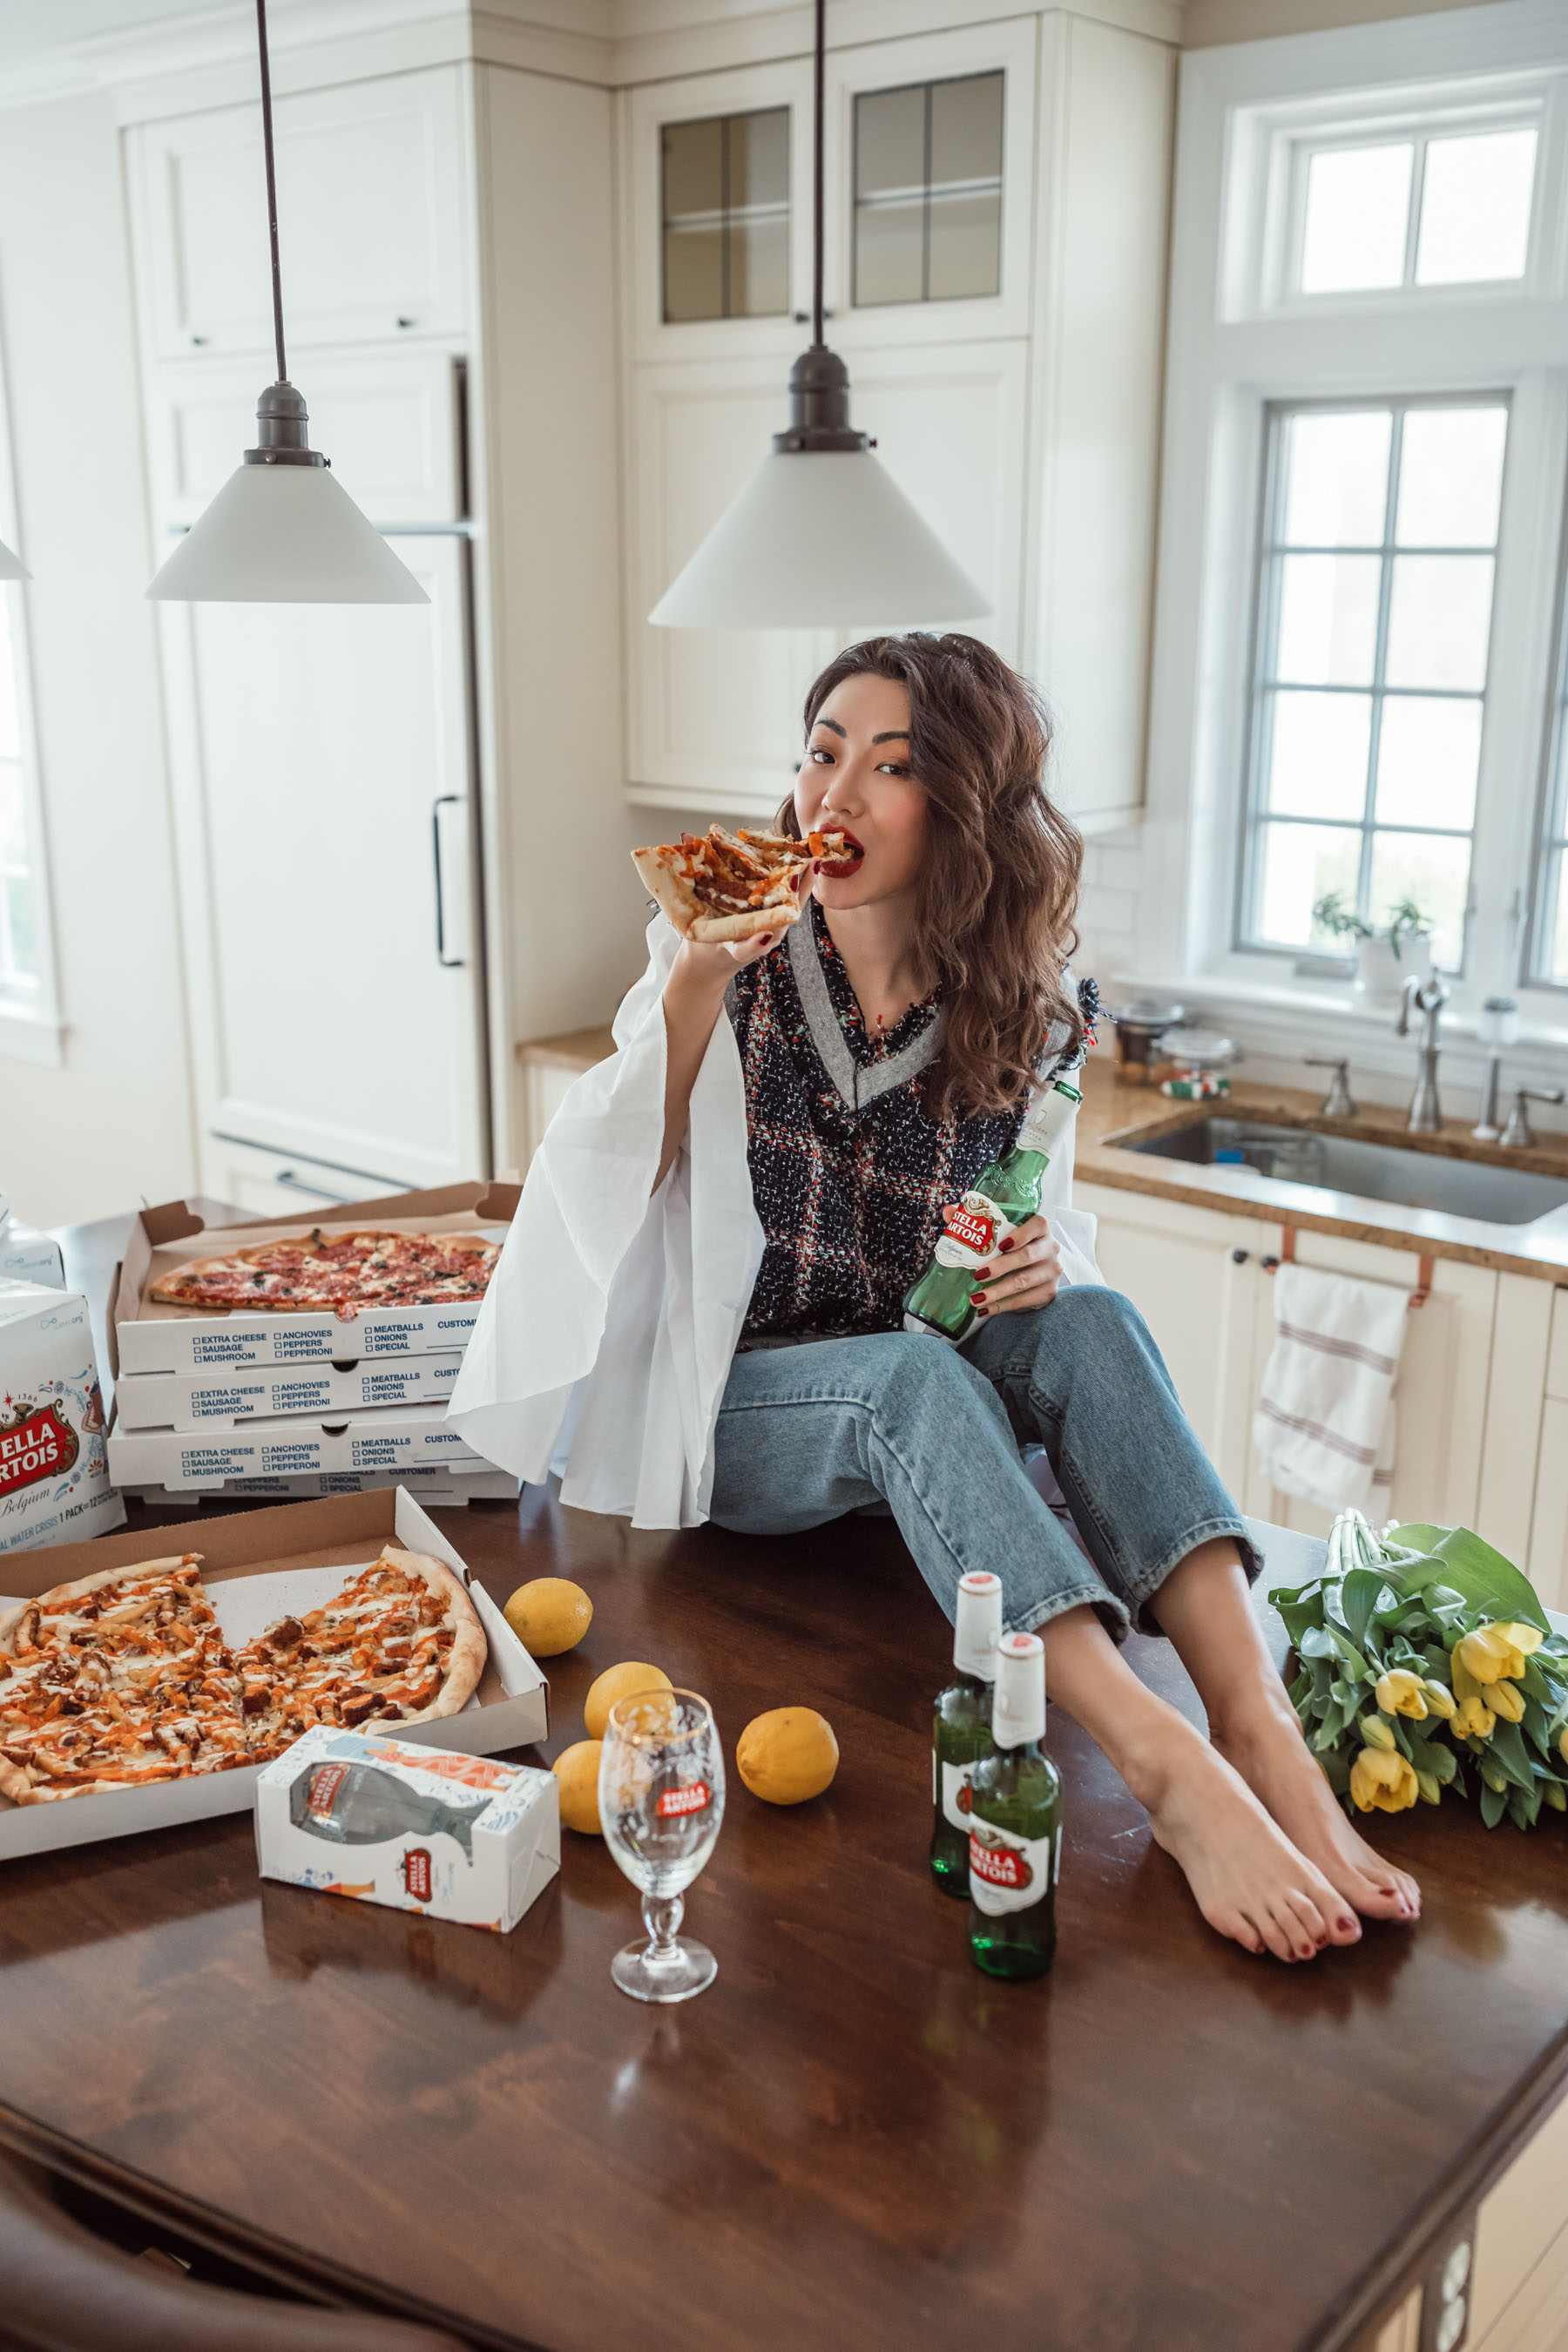 life hack products from amazon, blogger kitchen, stella artois // Notjessfashion